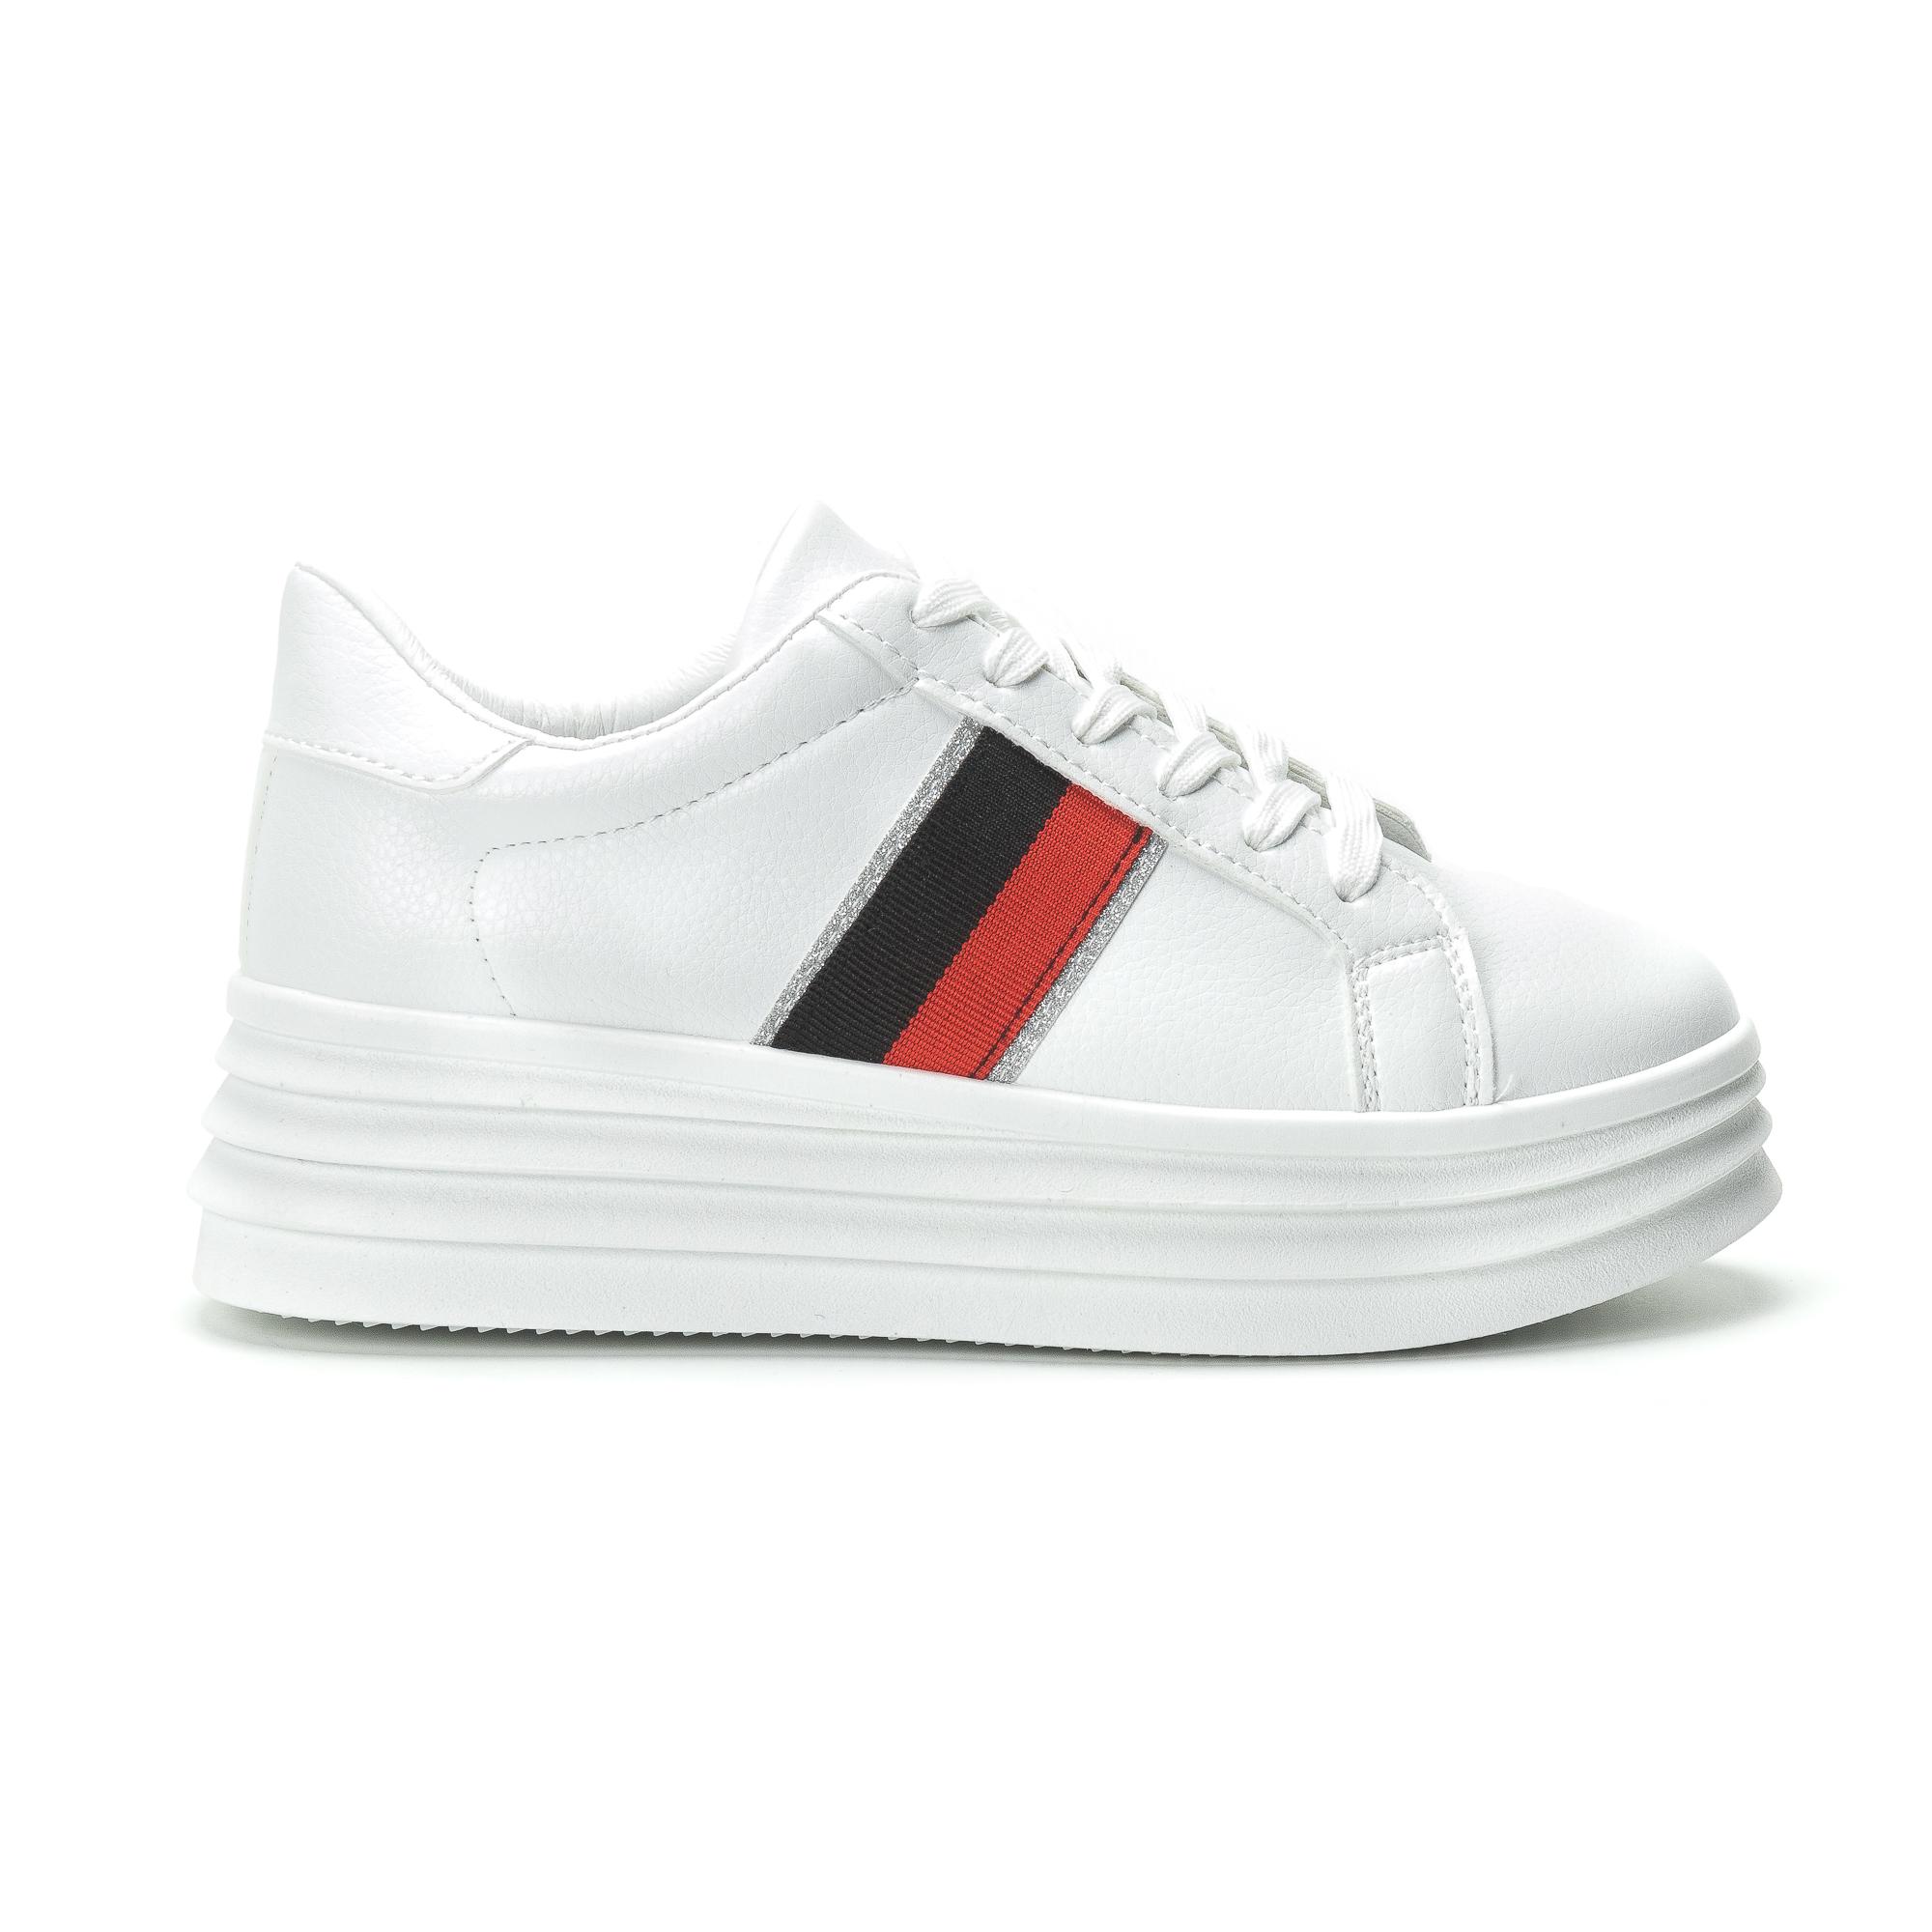 5f9ae7473d0 -20% Fashionmix Γυναικεία λευκά sneakers με διακοσμητική λεπτομέρεια